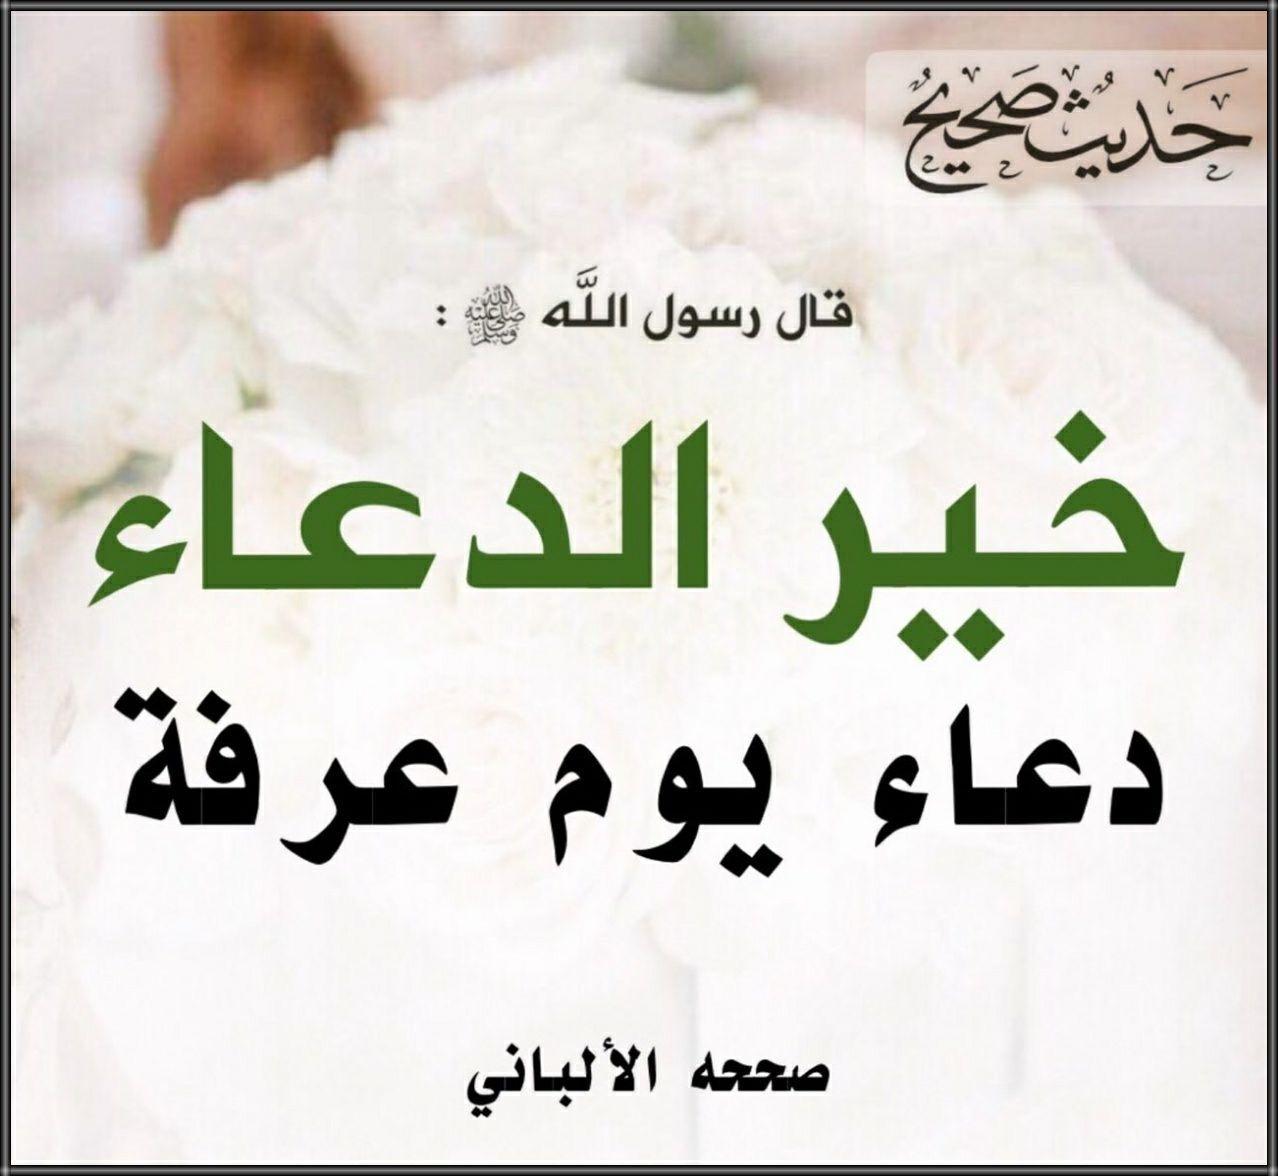 Pin By الأثر الجميل On أحاديث نبوية Quotes Islam Hadith